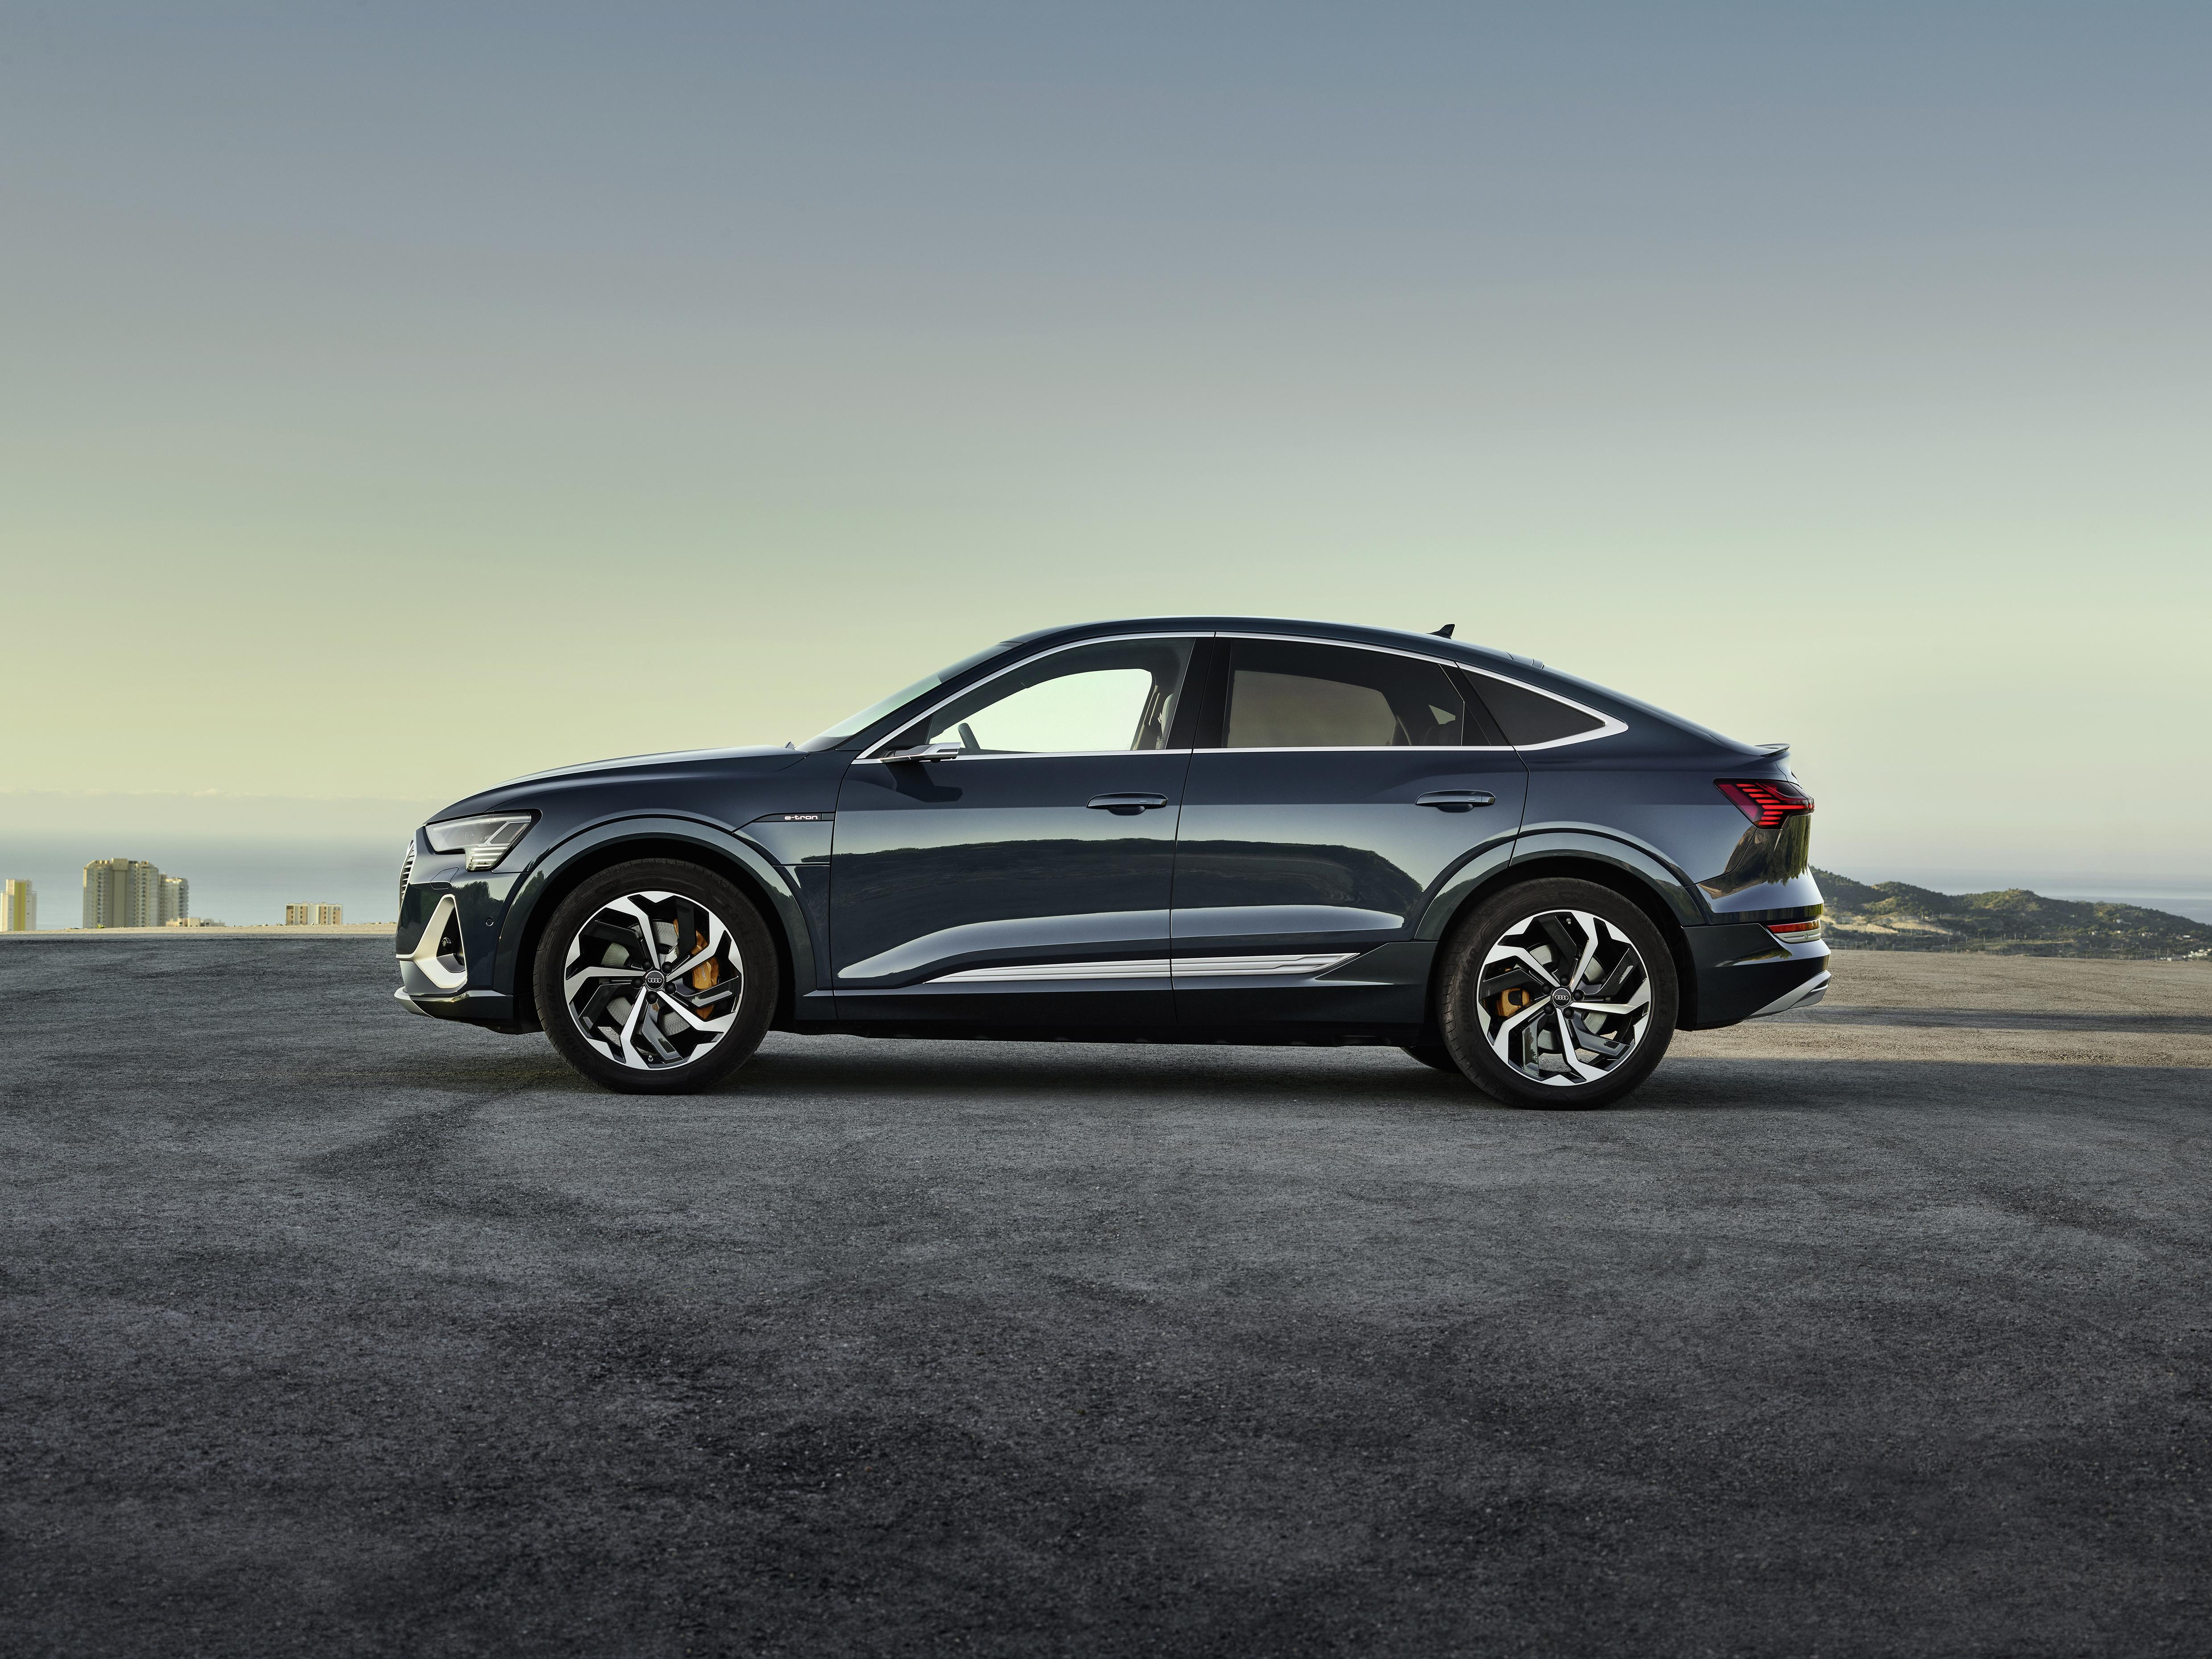 Der Audi e-tron Sportback in der exklusiven Farbe Plasmablau metallic. (AUDI)